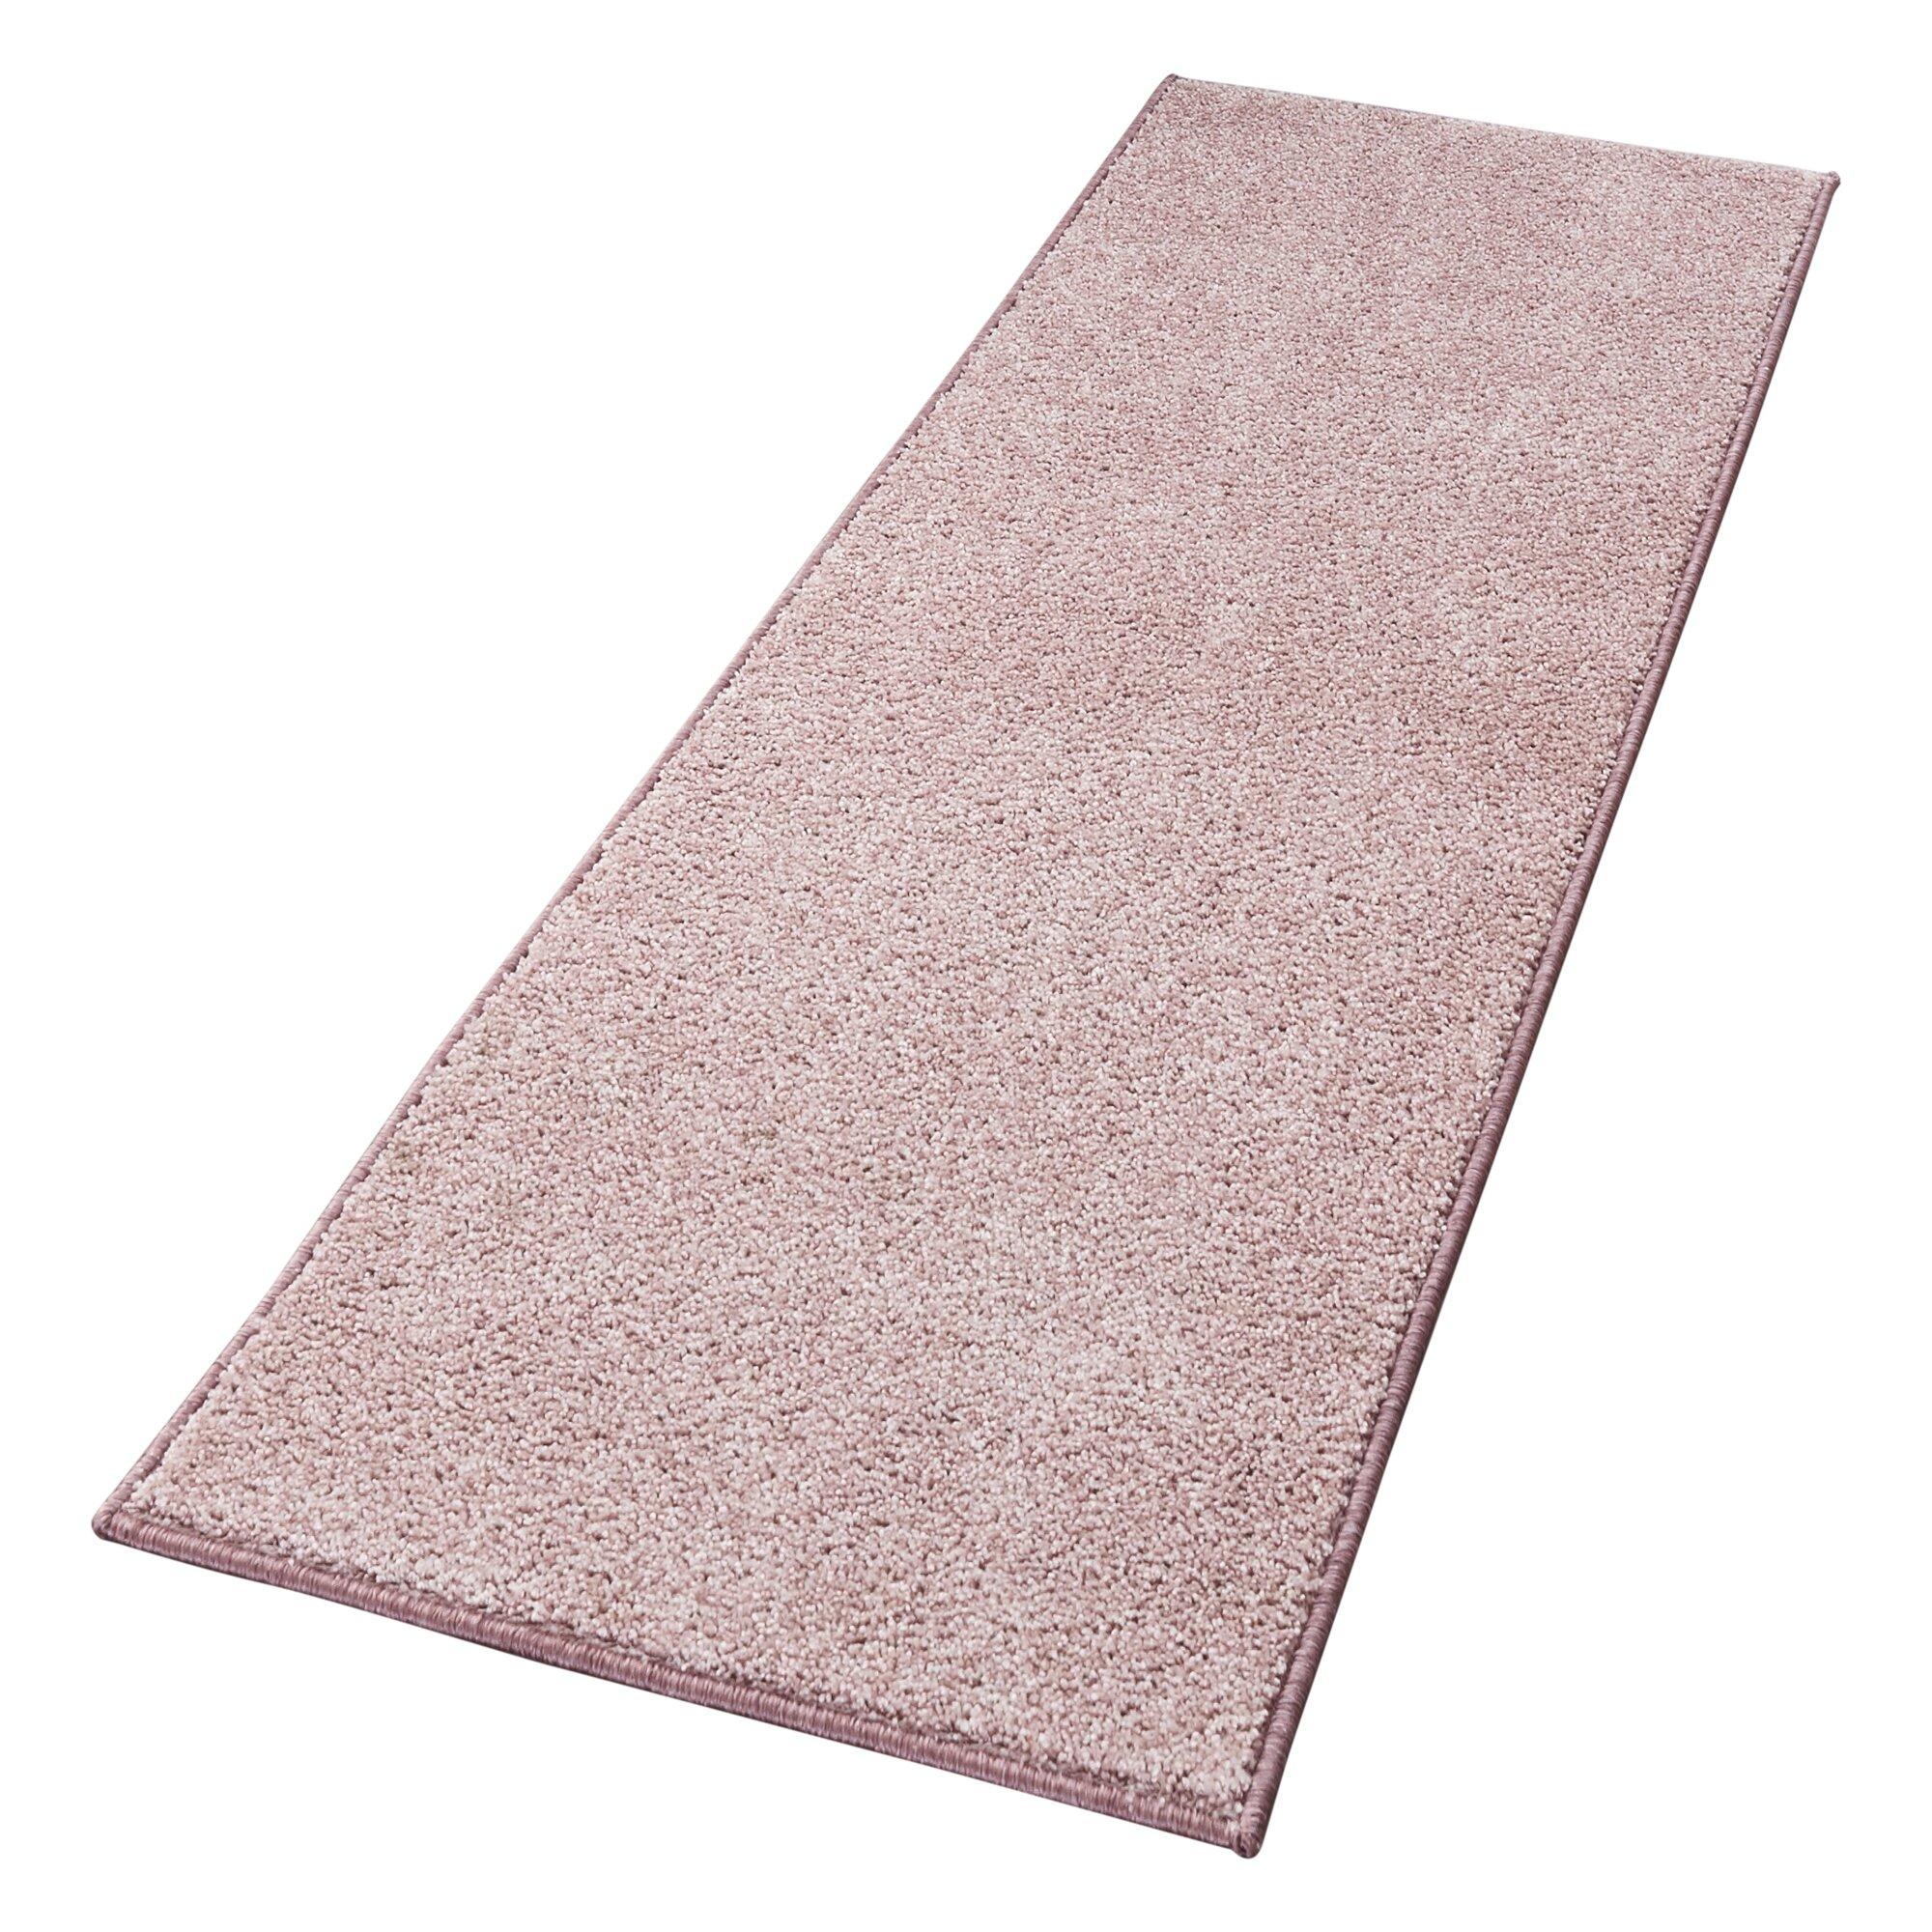 hanse home teppich pure in rosa. Black Bedroom Furniture Sets. Home Design Ideas